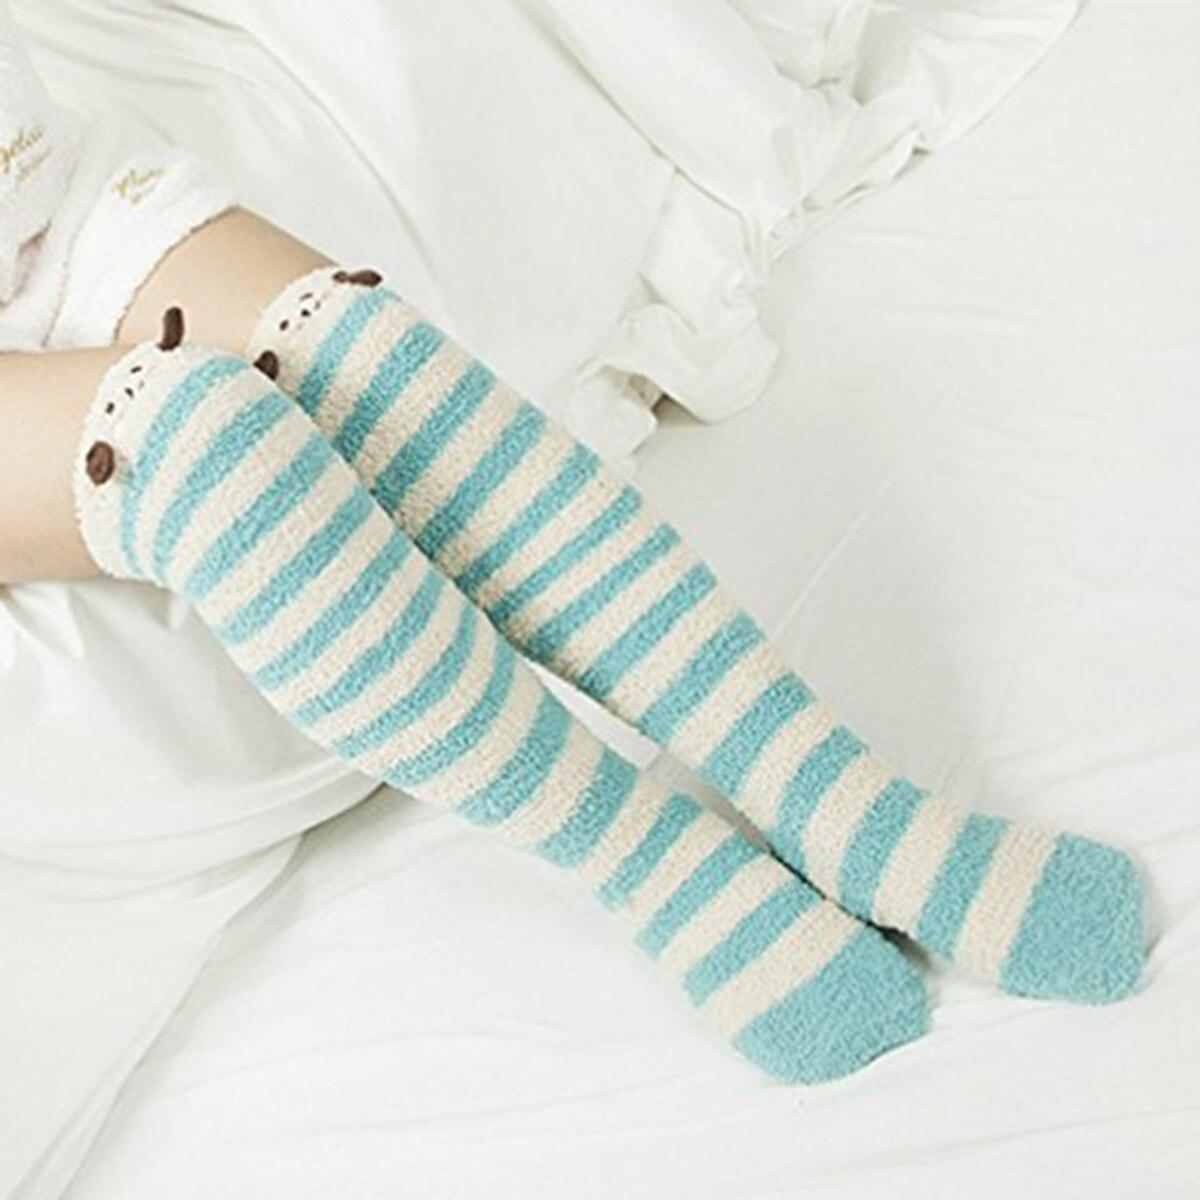 2018 Kawaii Japanese Animal Printed Knee Socks Striped Cute Lovely Long Thigh High Socks Compression Winter Warm Medias Sock